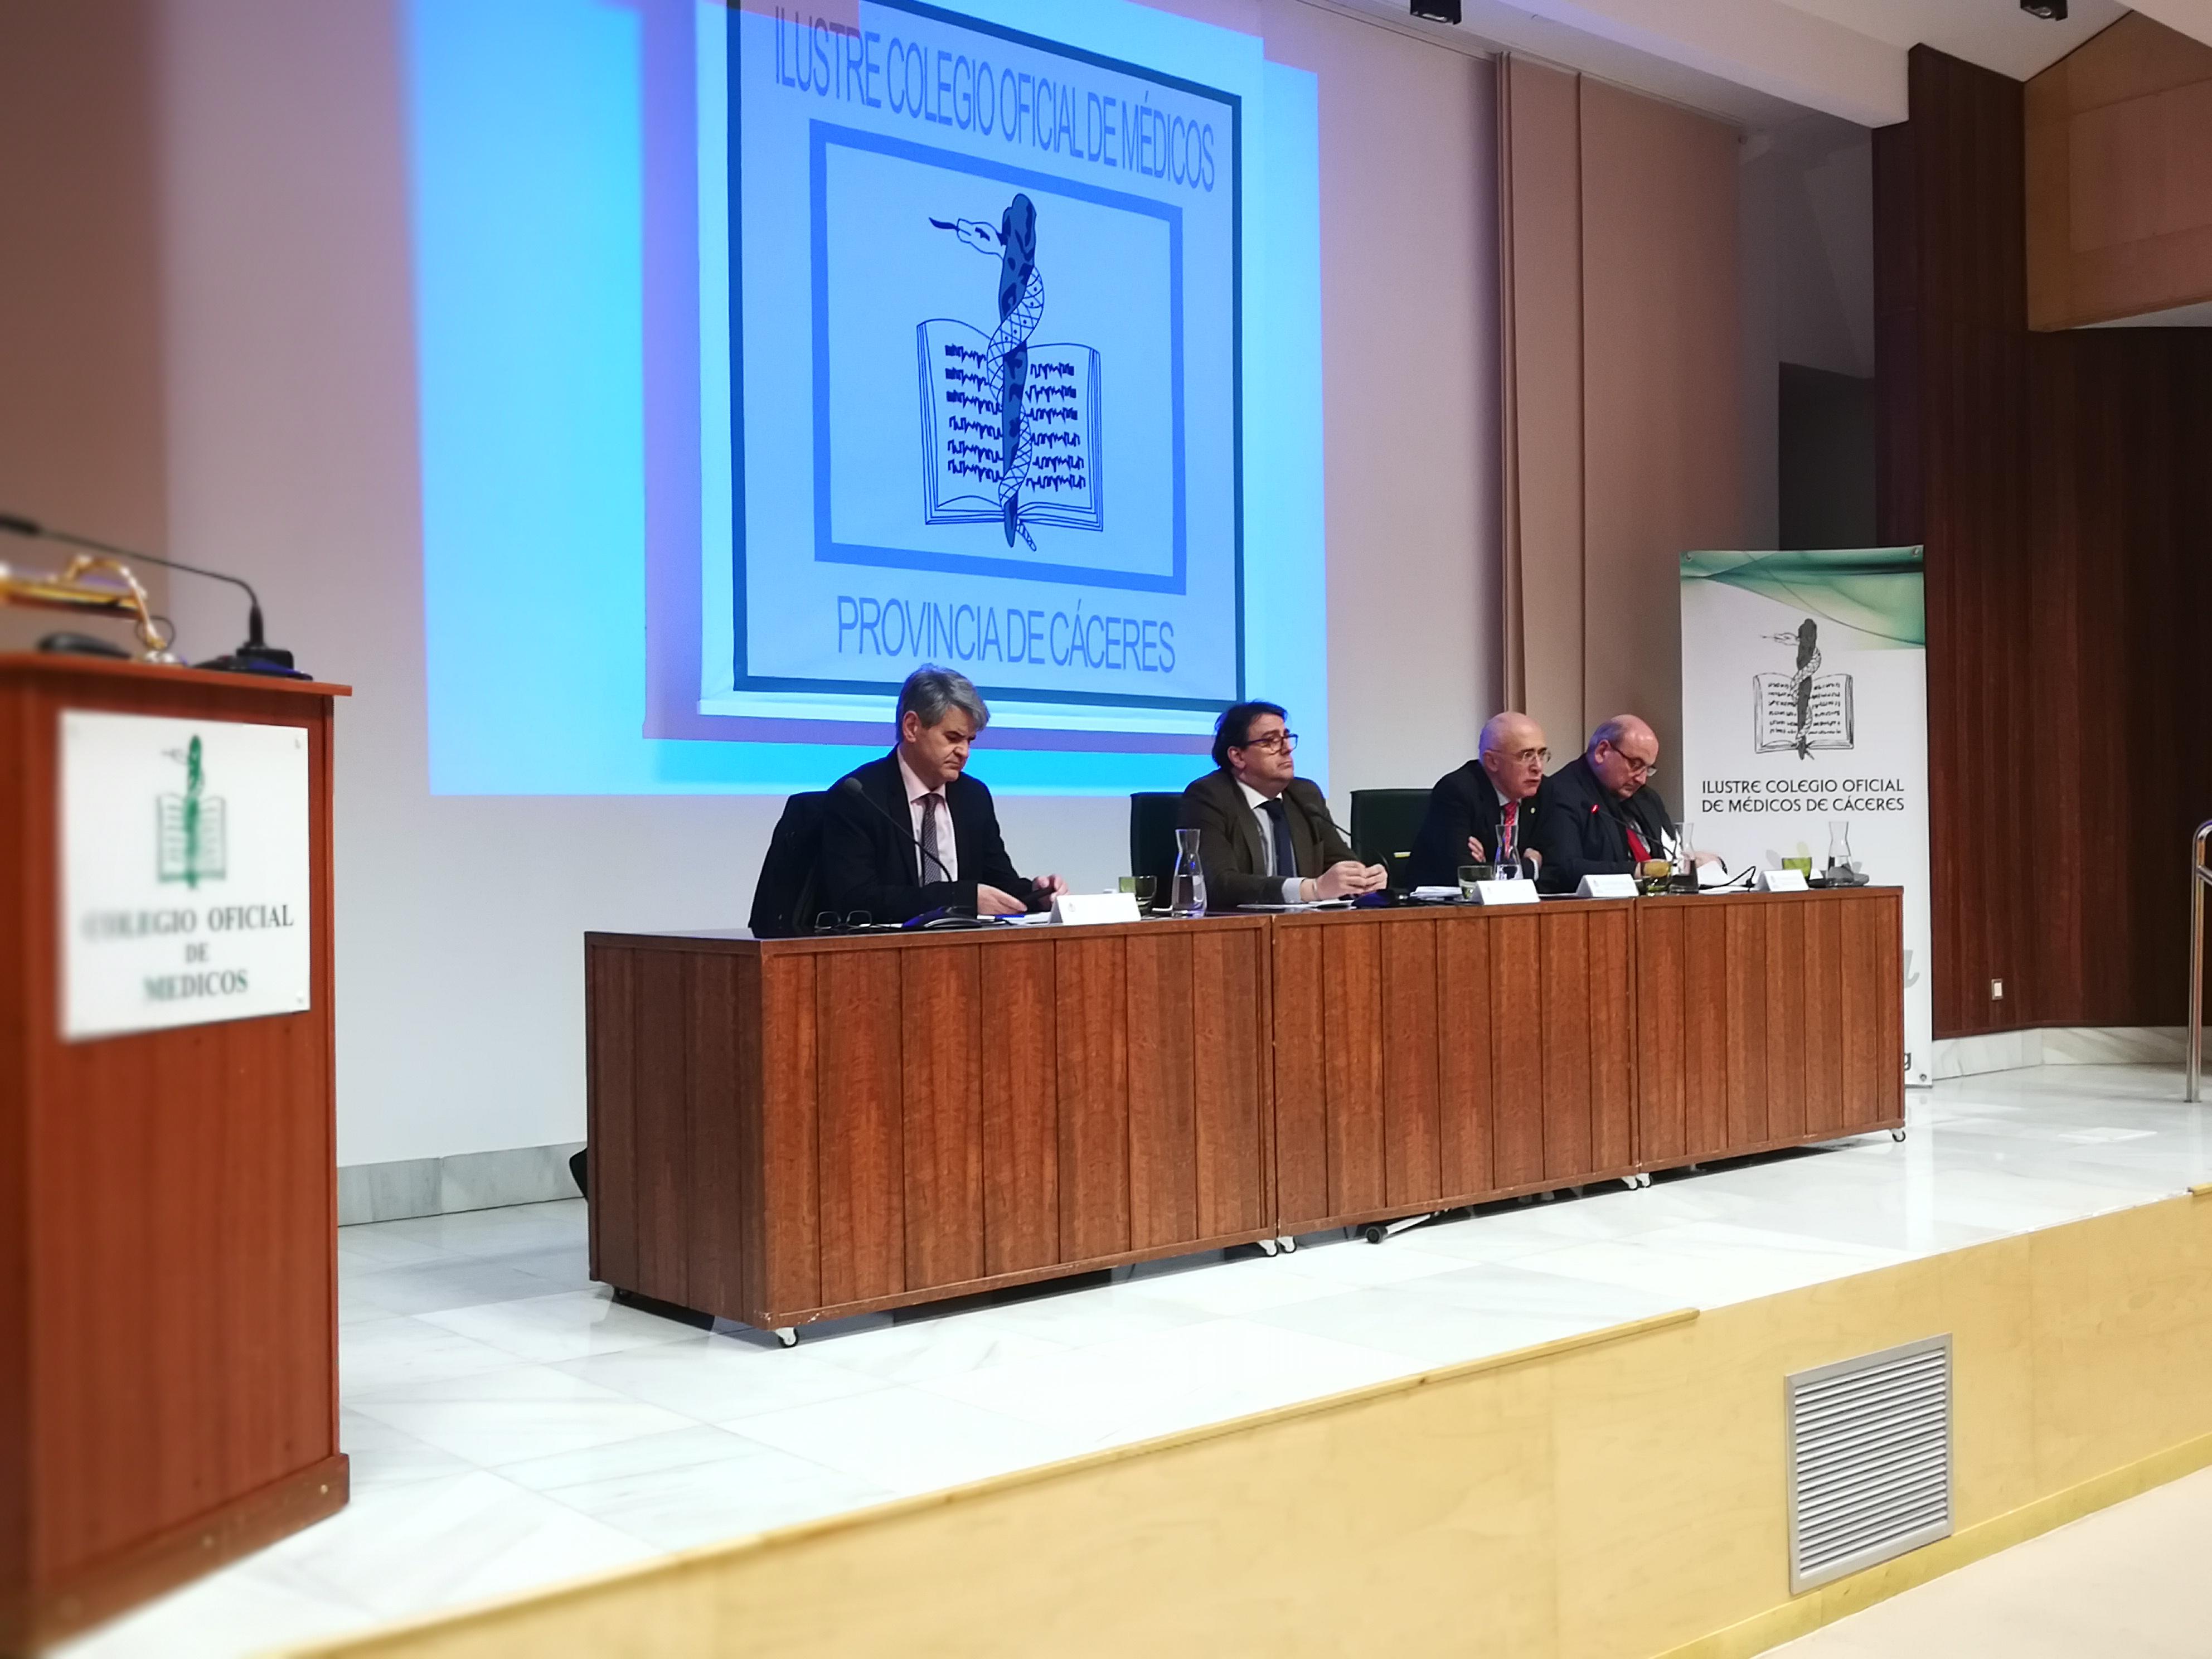 Presentación hospital universitario de cáceres